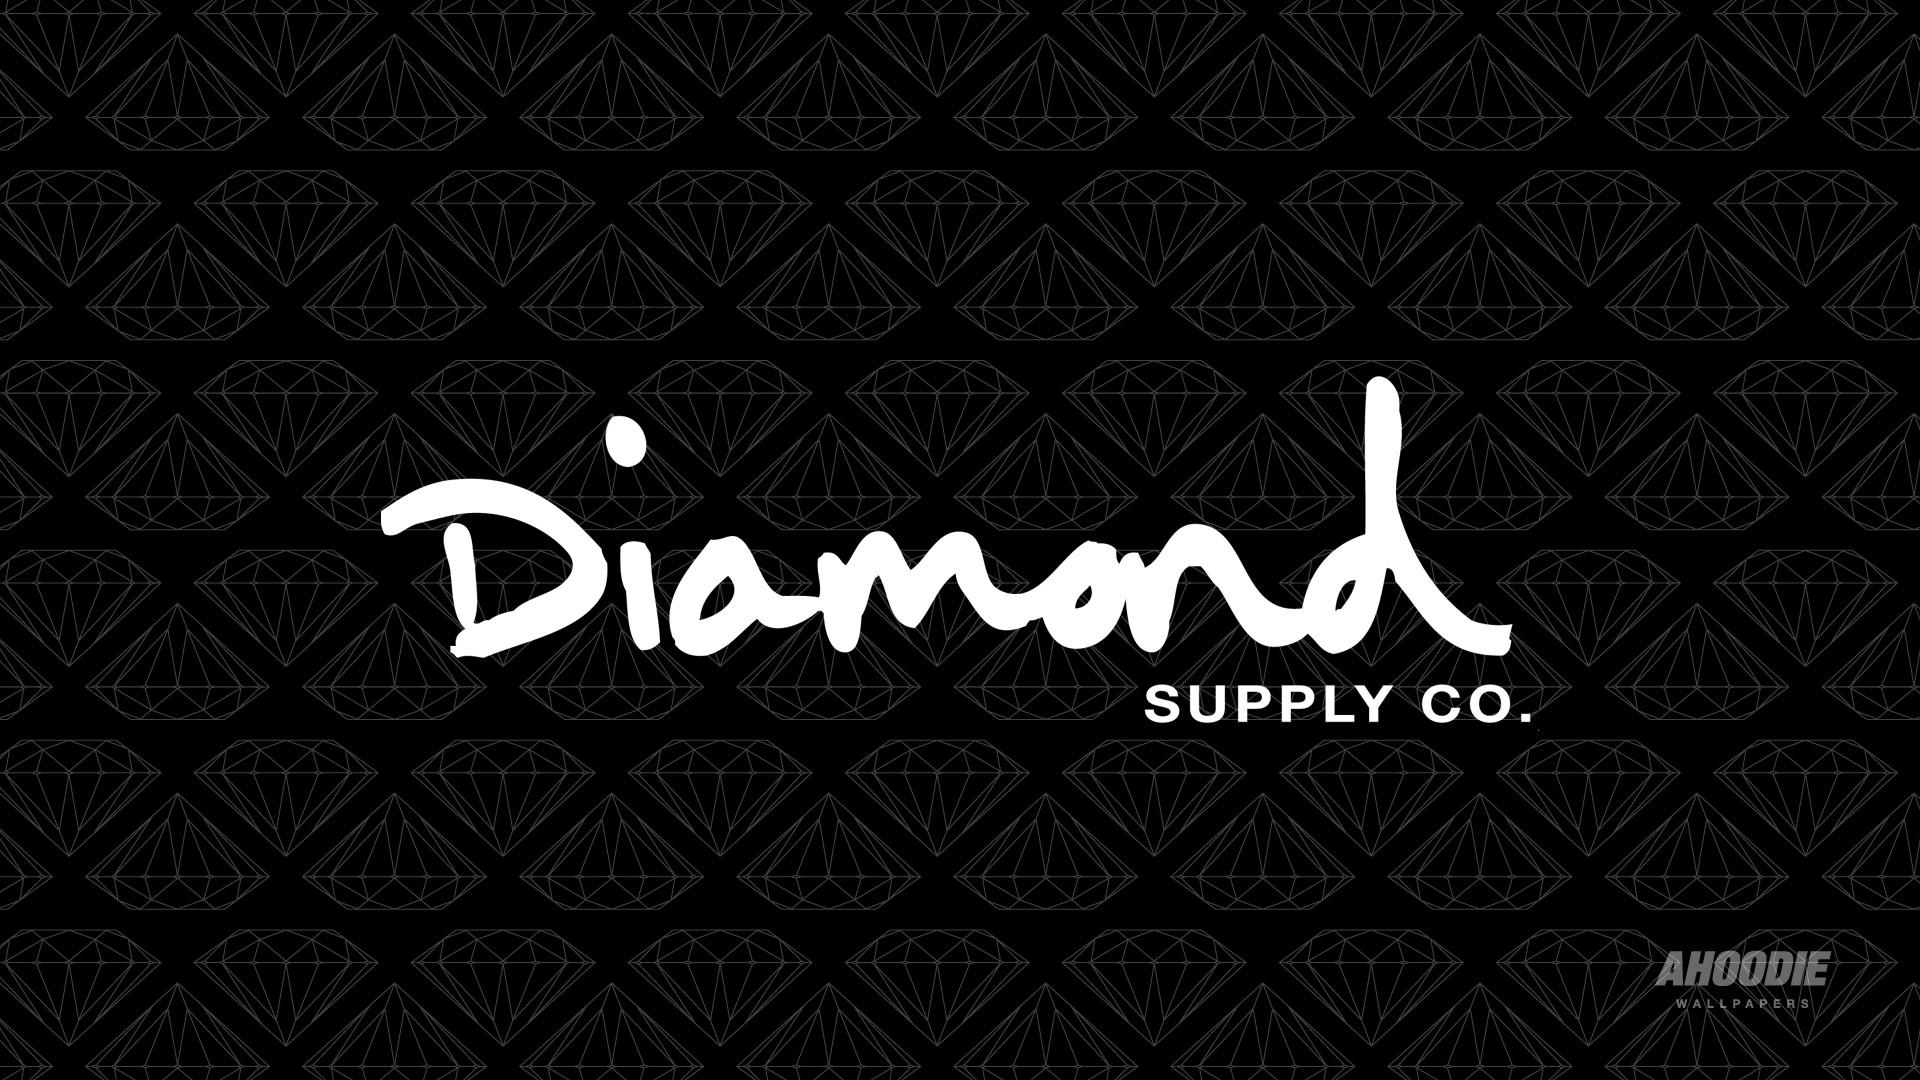 Res: 1920x1080, 9. diamond-wallpaper9-600x338